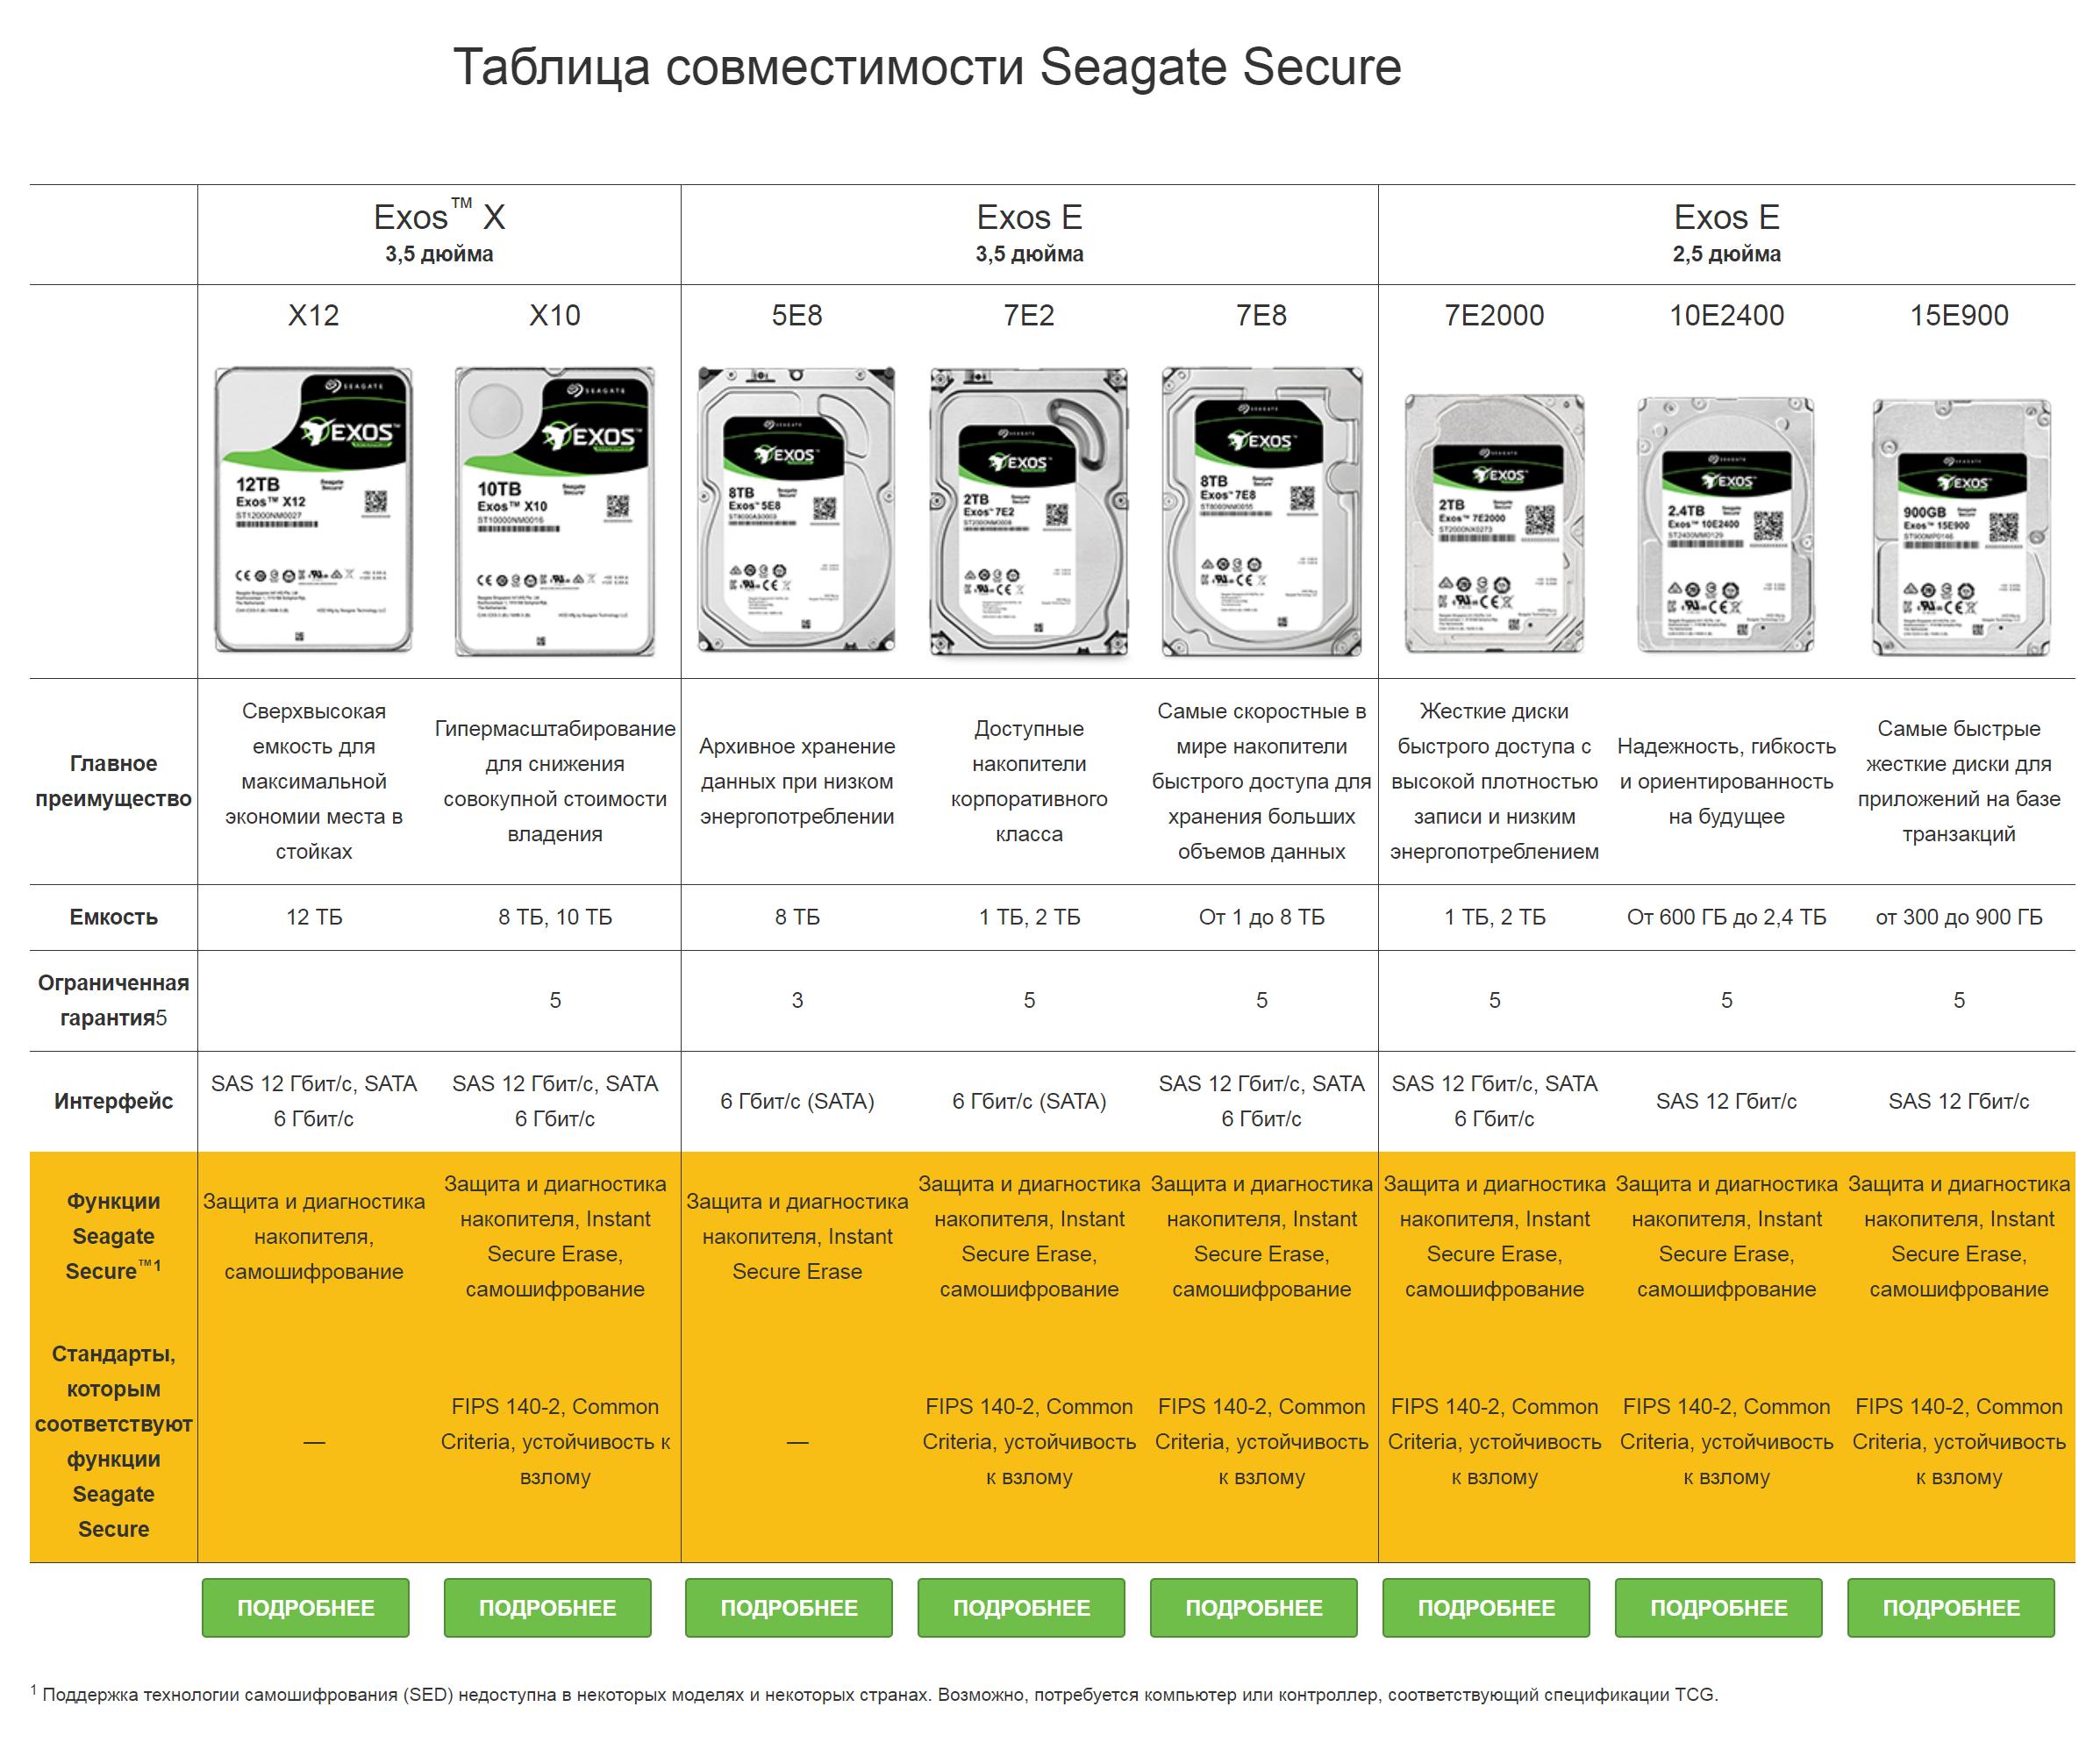 Таблица совместимости Seagate Secure